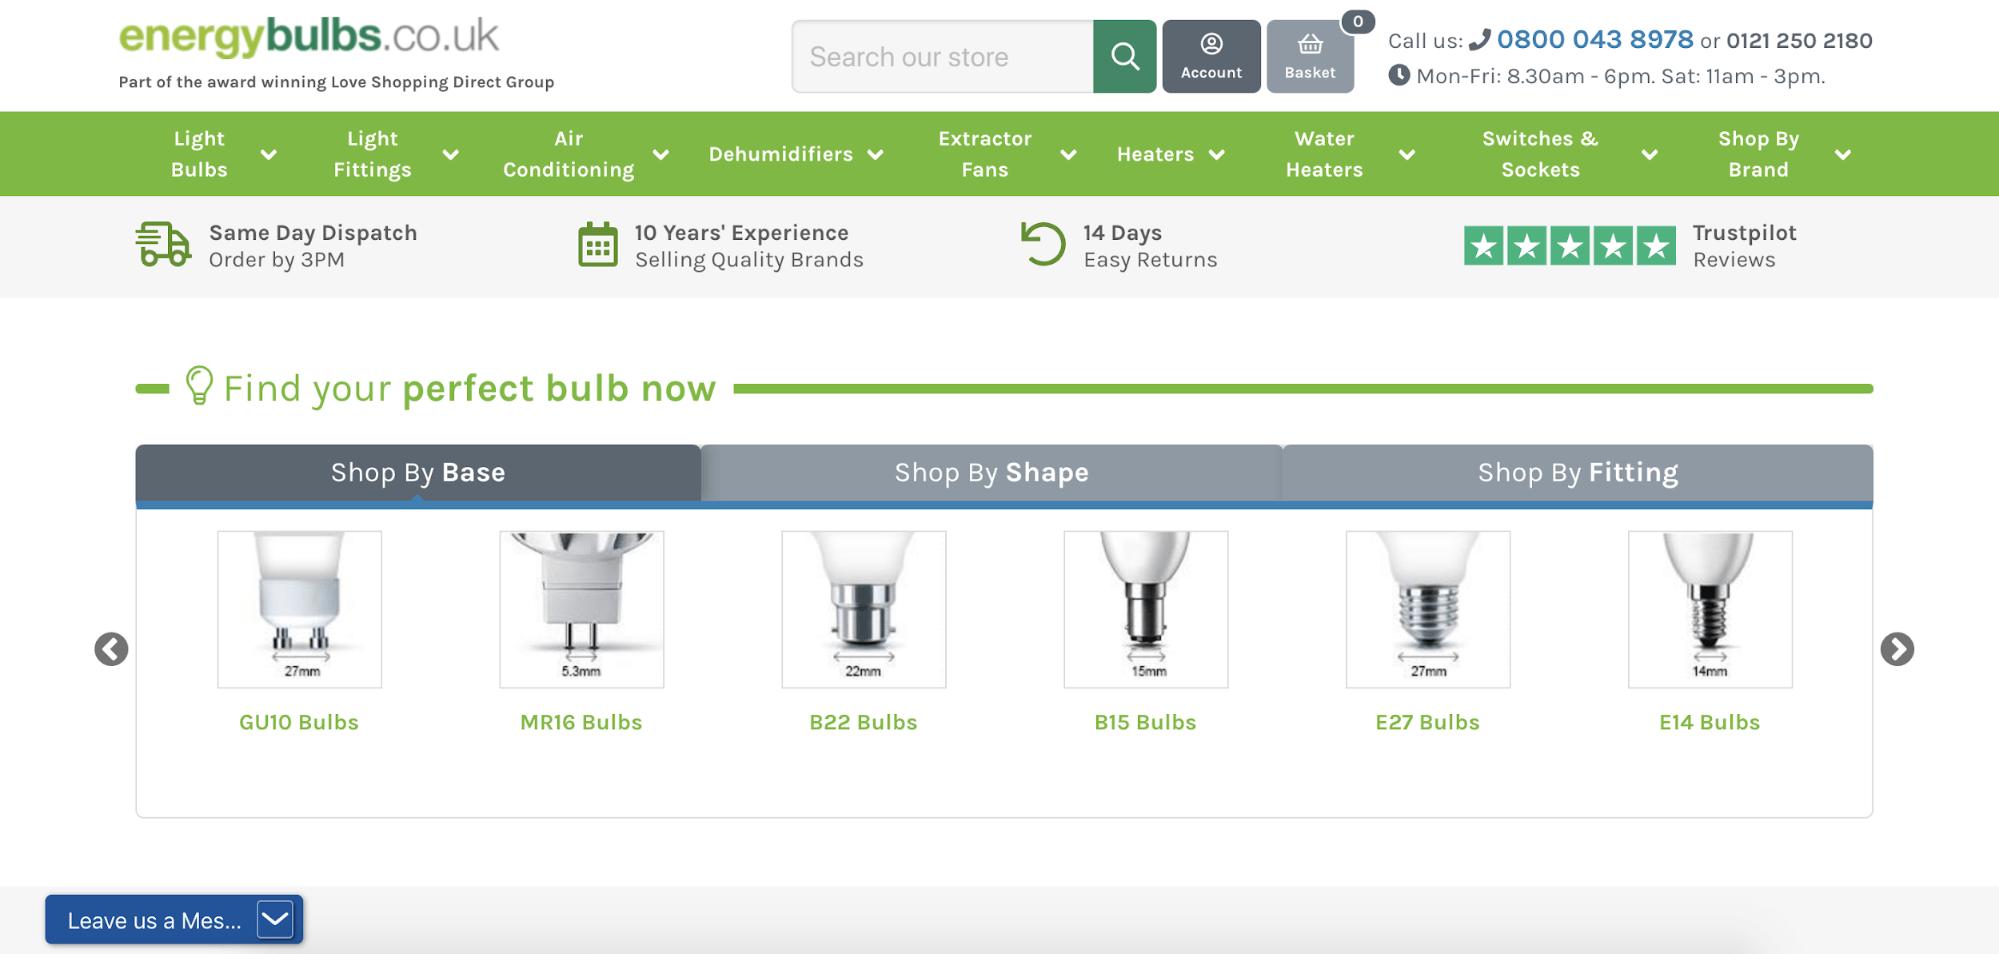 Energybulbs.co.uk online experience